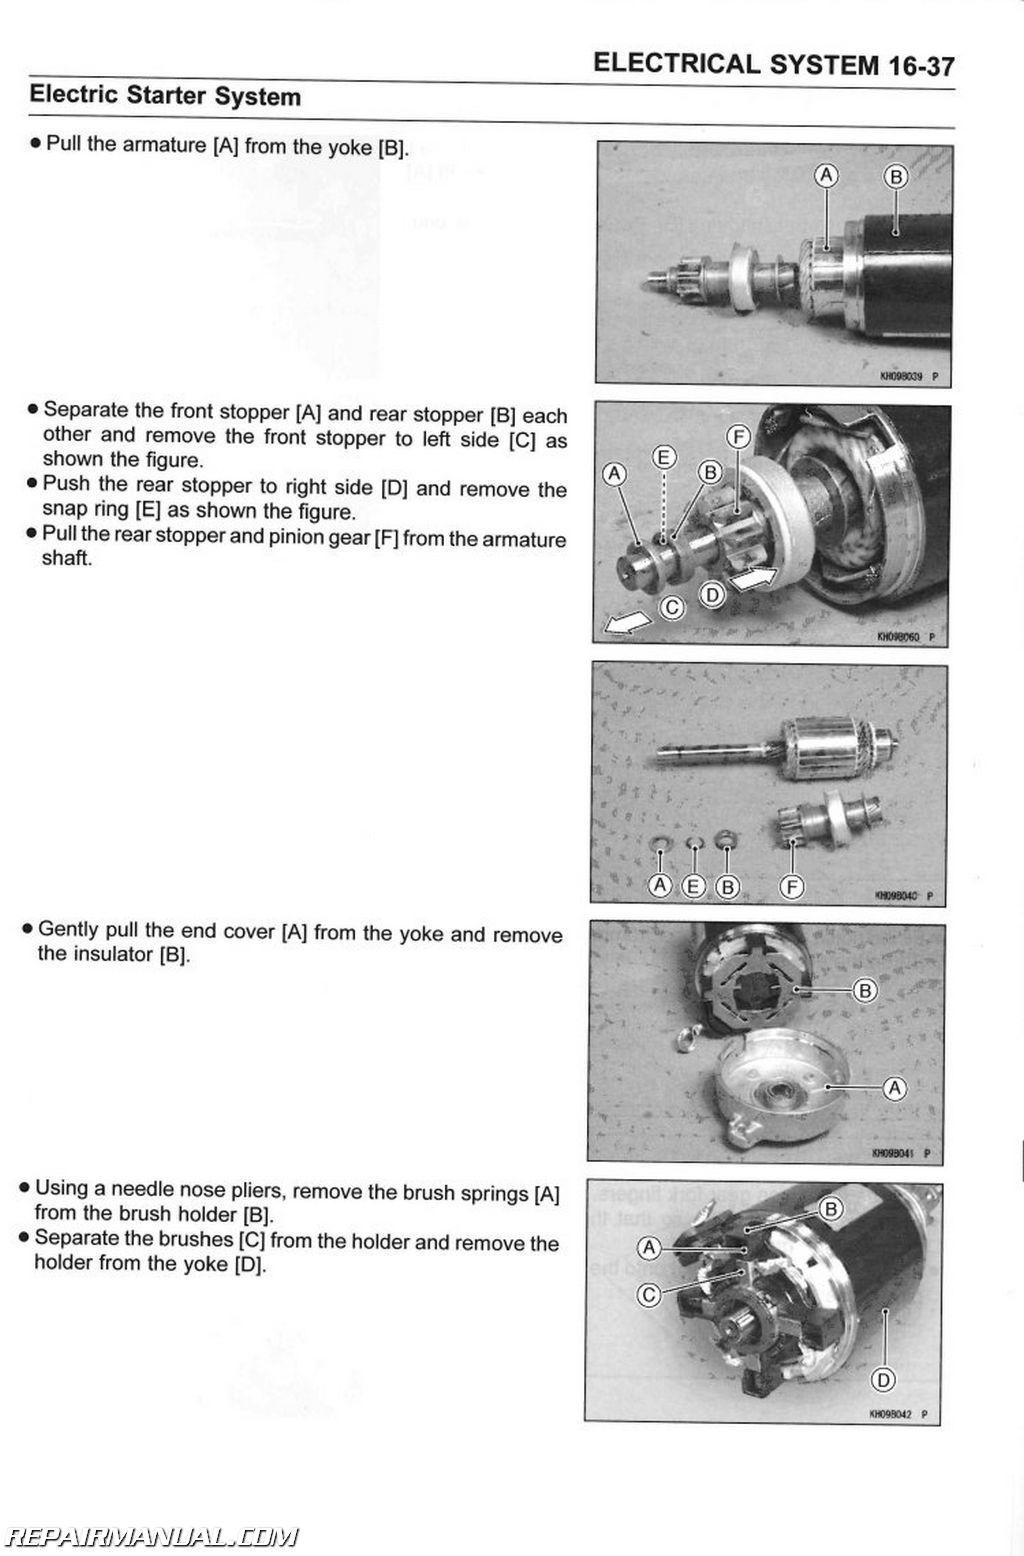 2005 2015 Kawasaki KAF400 Mule 610 4%C3%974 600 Service Manual page 11 kawasaki mule wiring diagram & 1995 kawasaki bayou 220 10 best klx650 wiring diagram at n-0.co